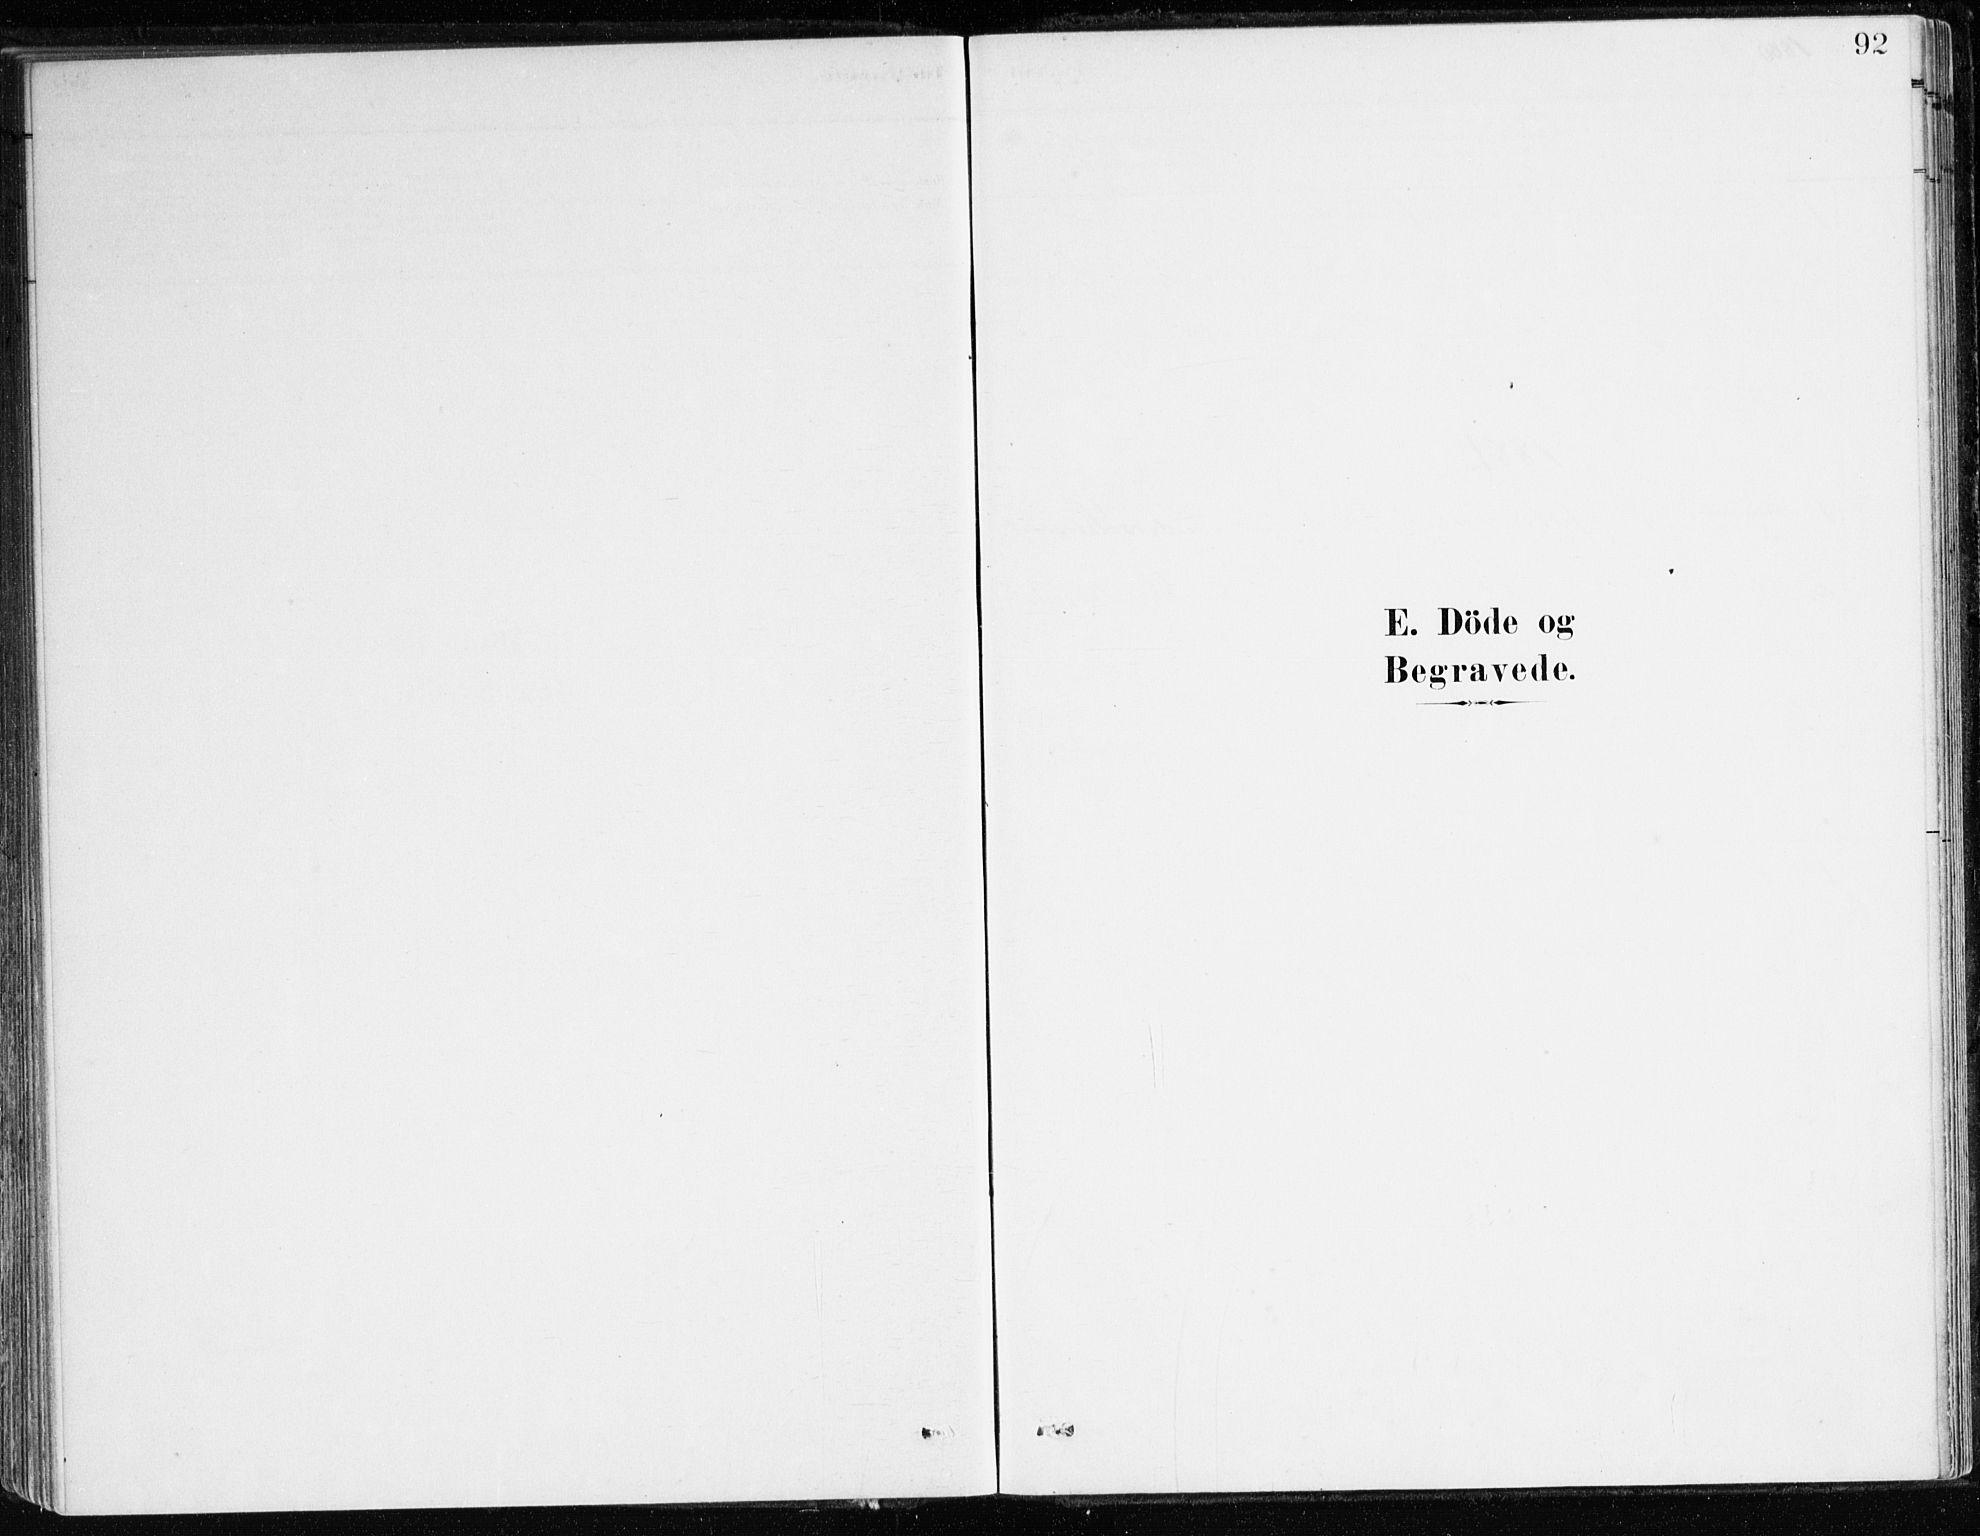 SAB, Aurland Sokneprestembete*, Ministerialbok nr. C 1, 1880-1921, s. 92